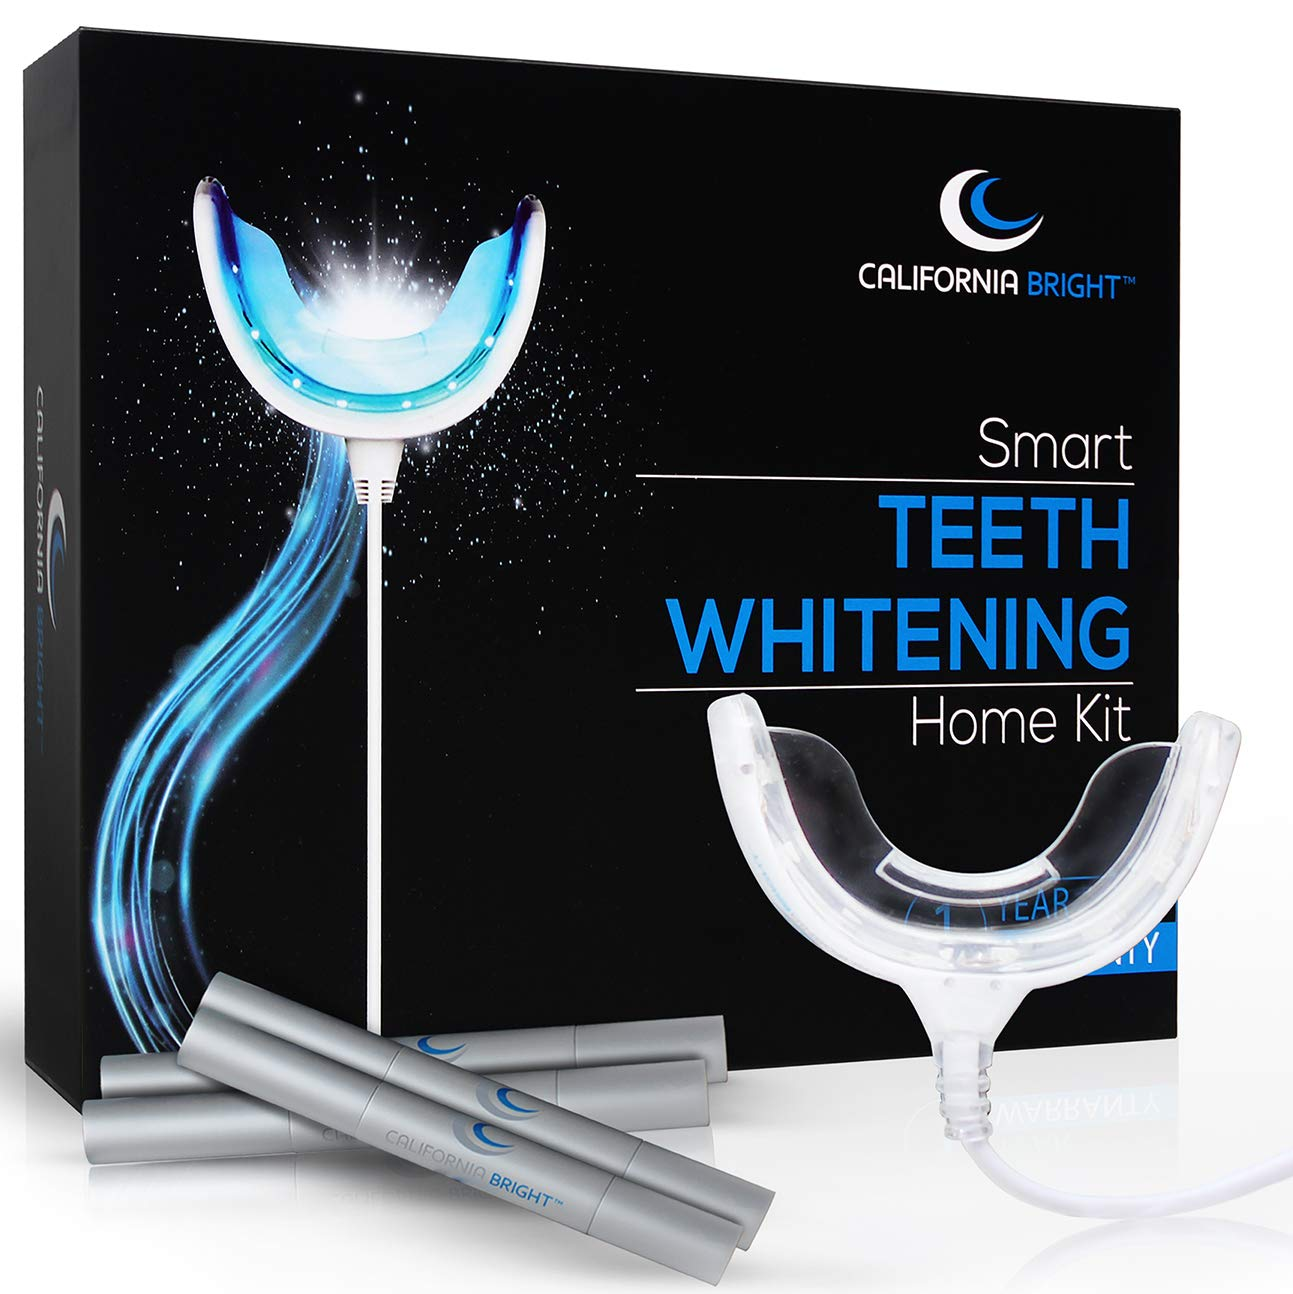 Amazon Com California Bright Smart Teeth Whitening Home Kit With